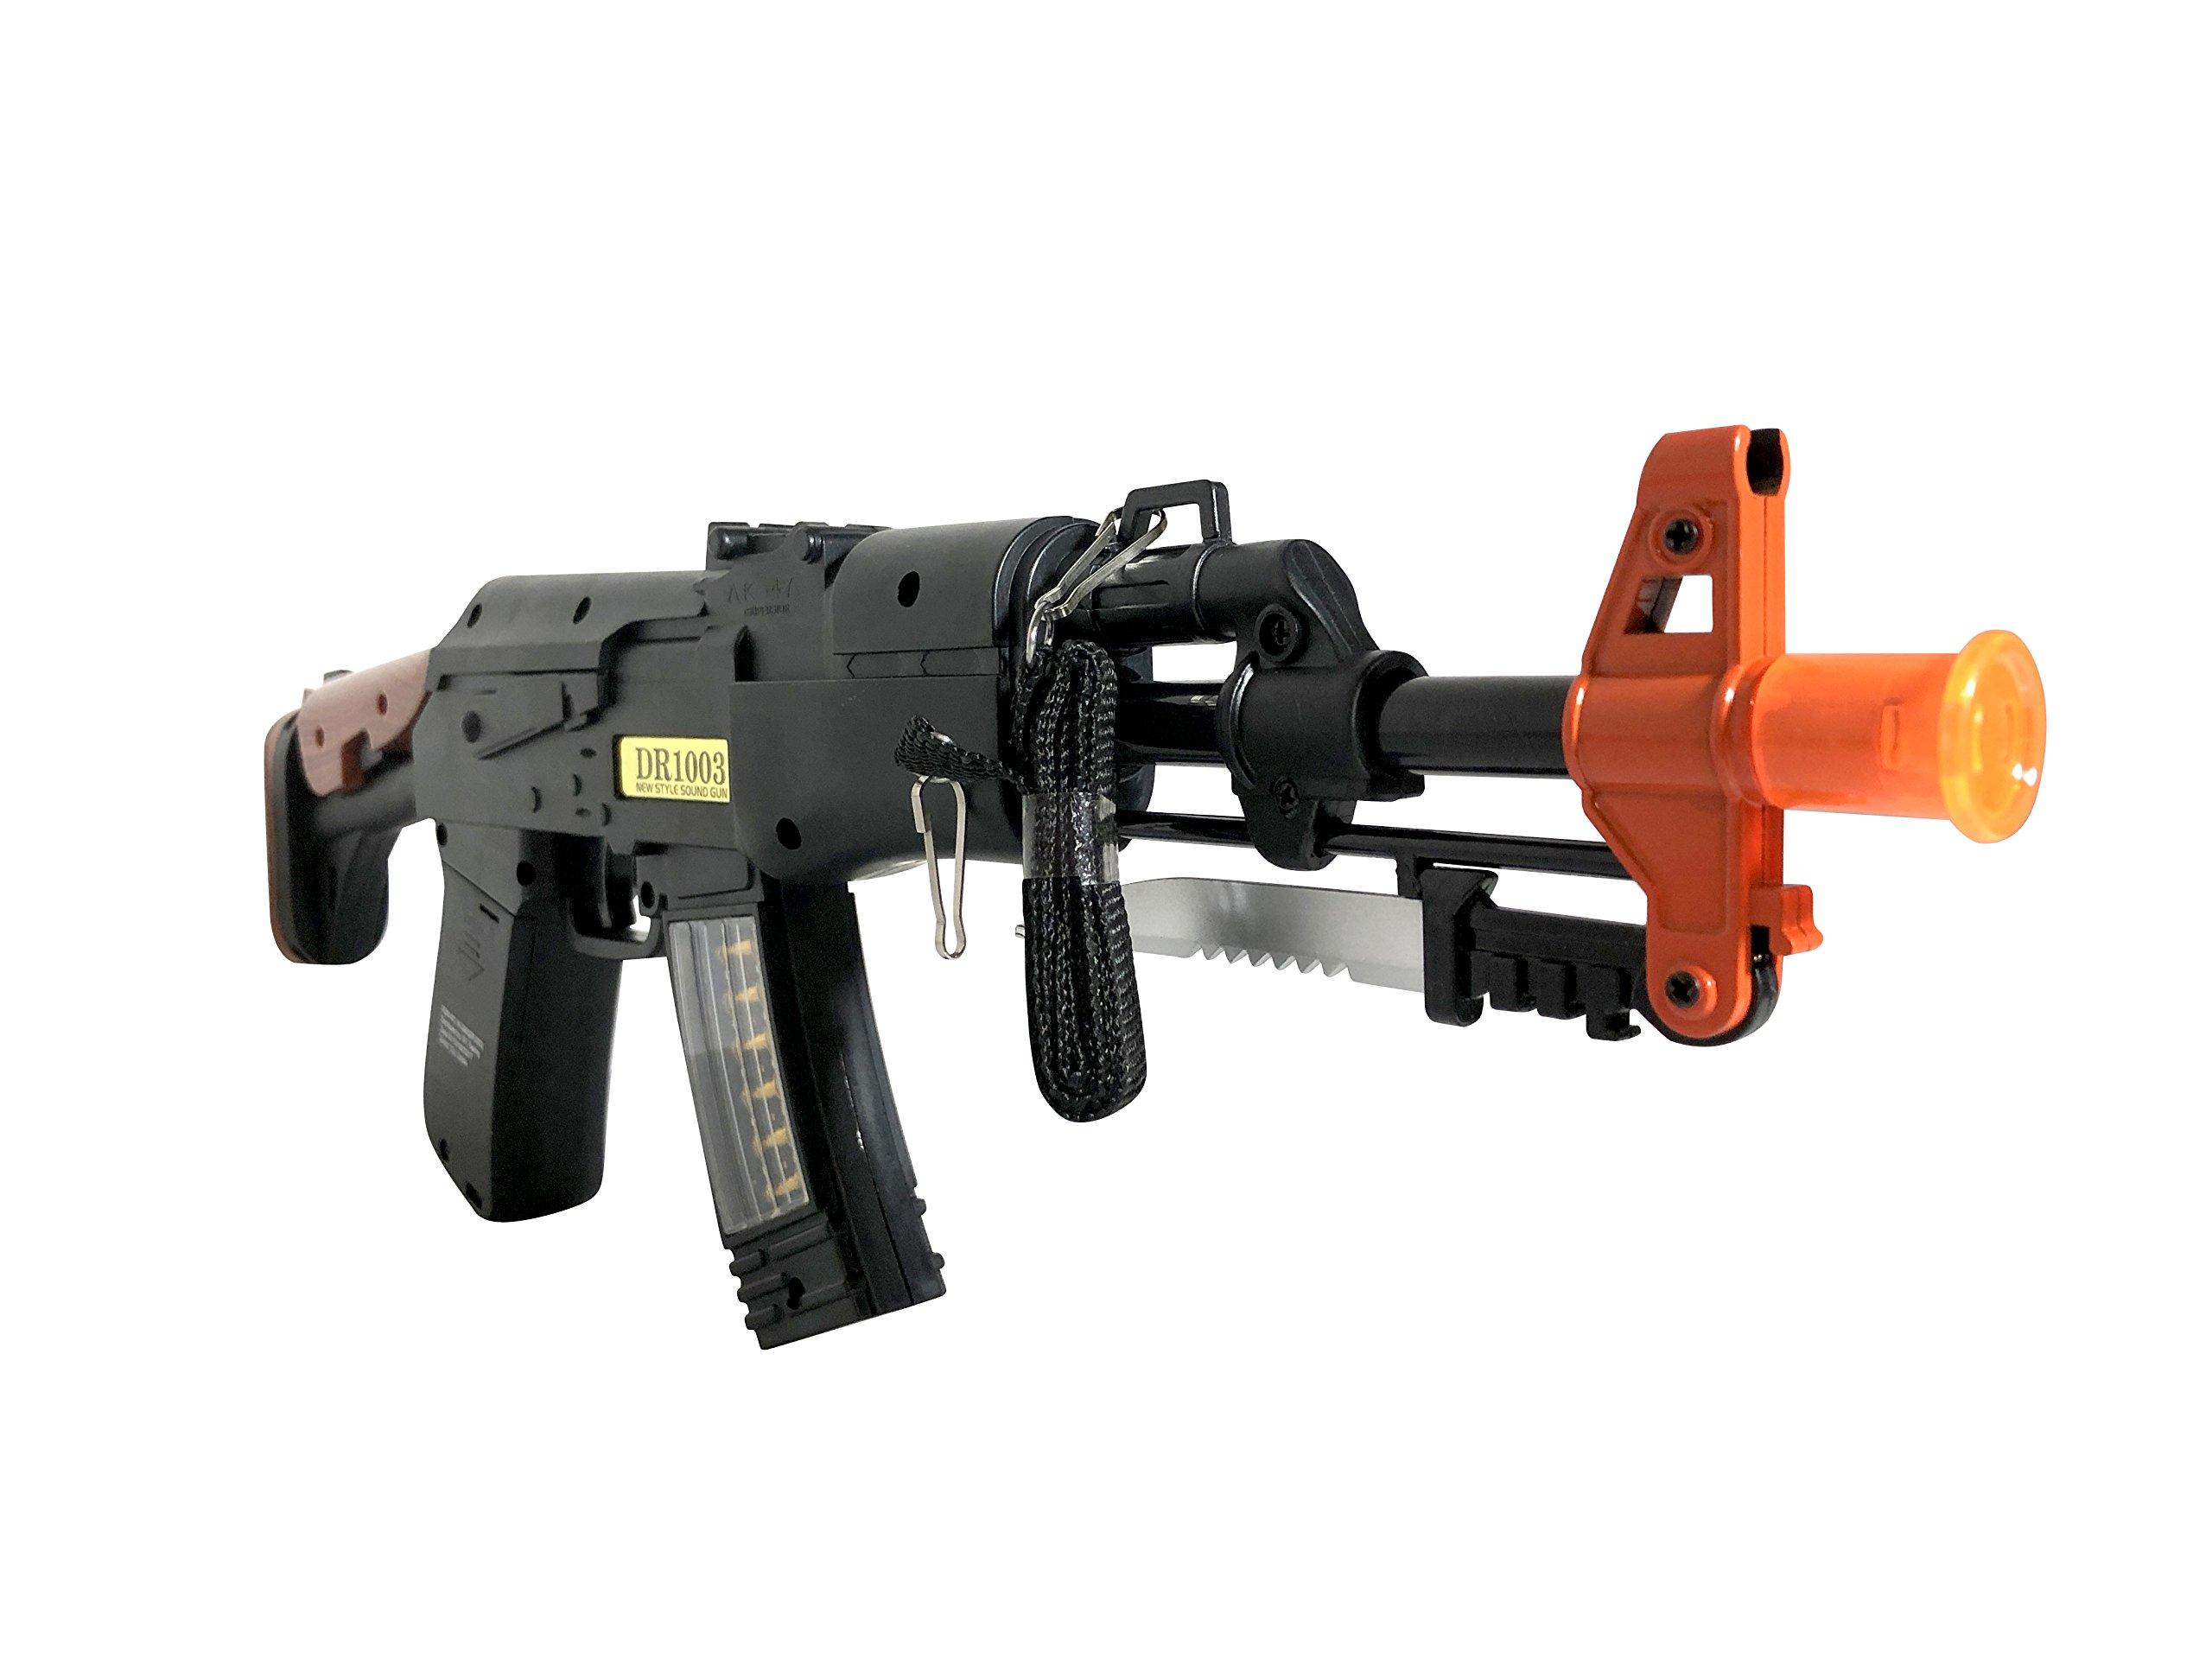 LED Toy Gun - 16 Inch Machine Blaster with Knife